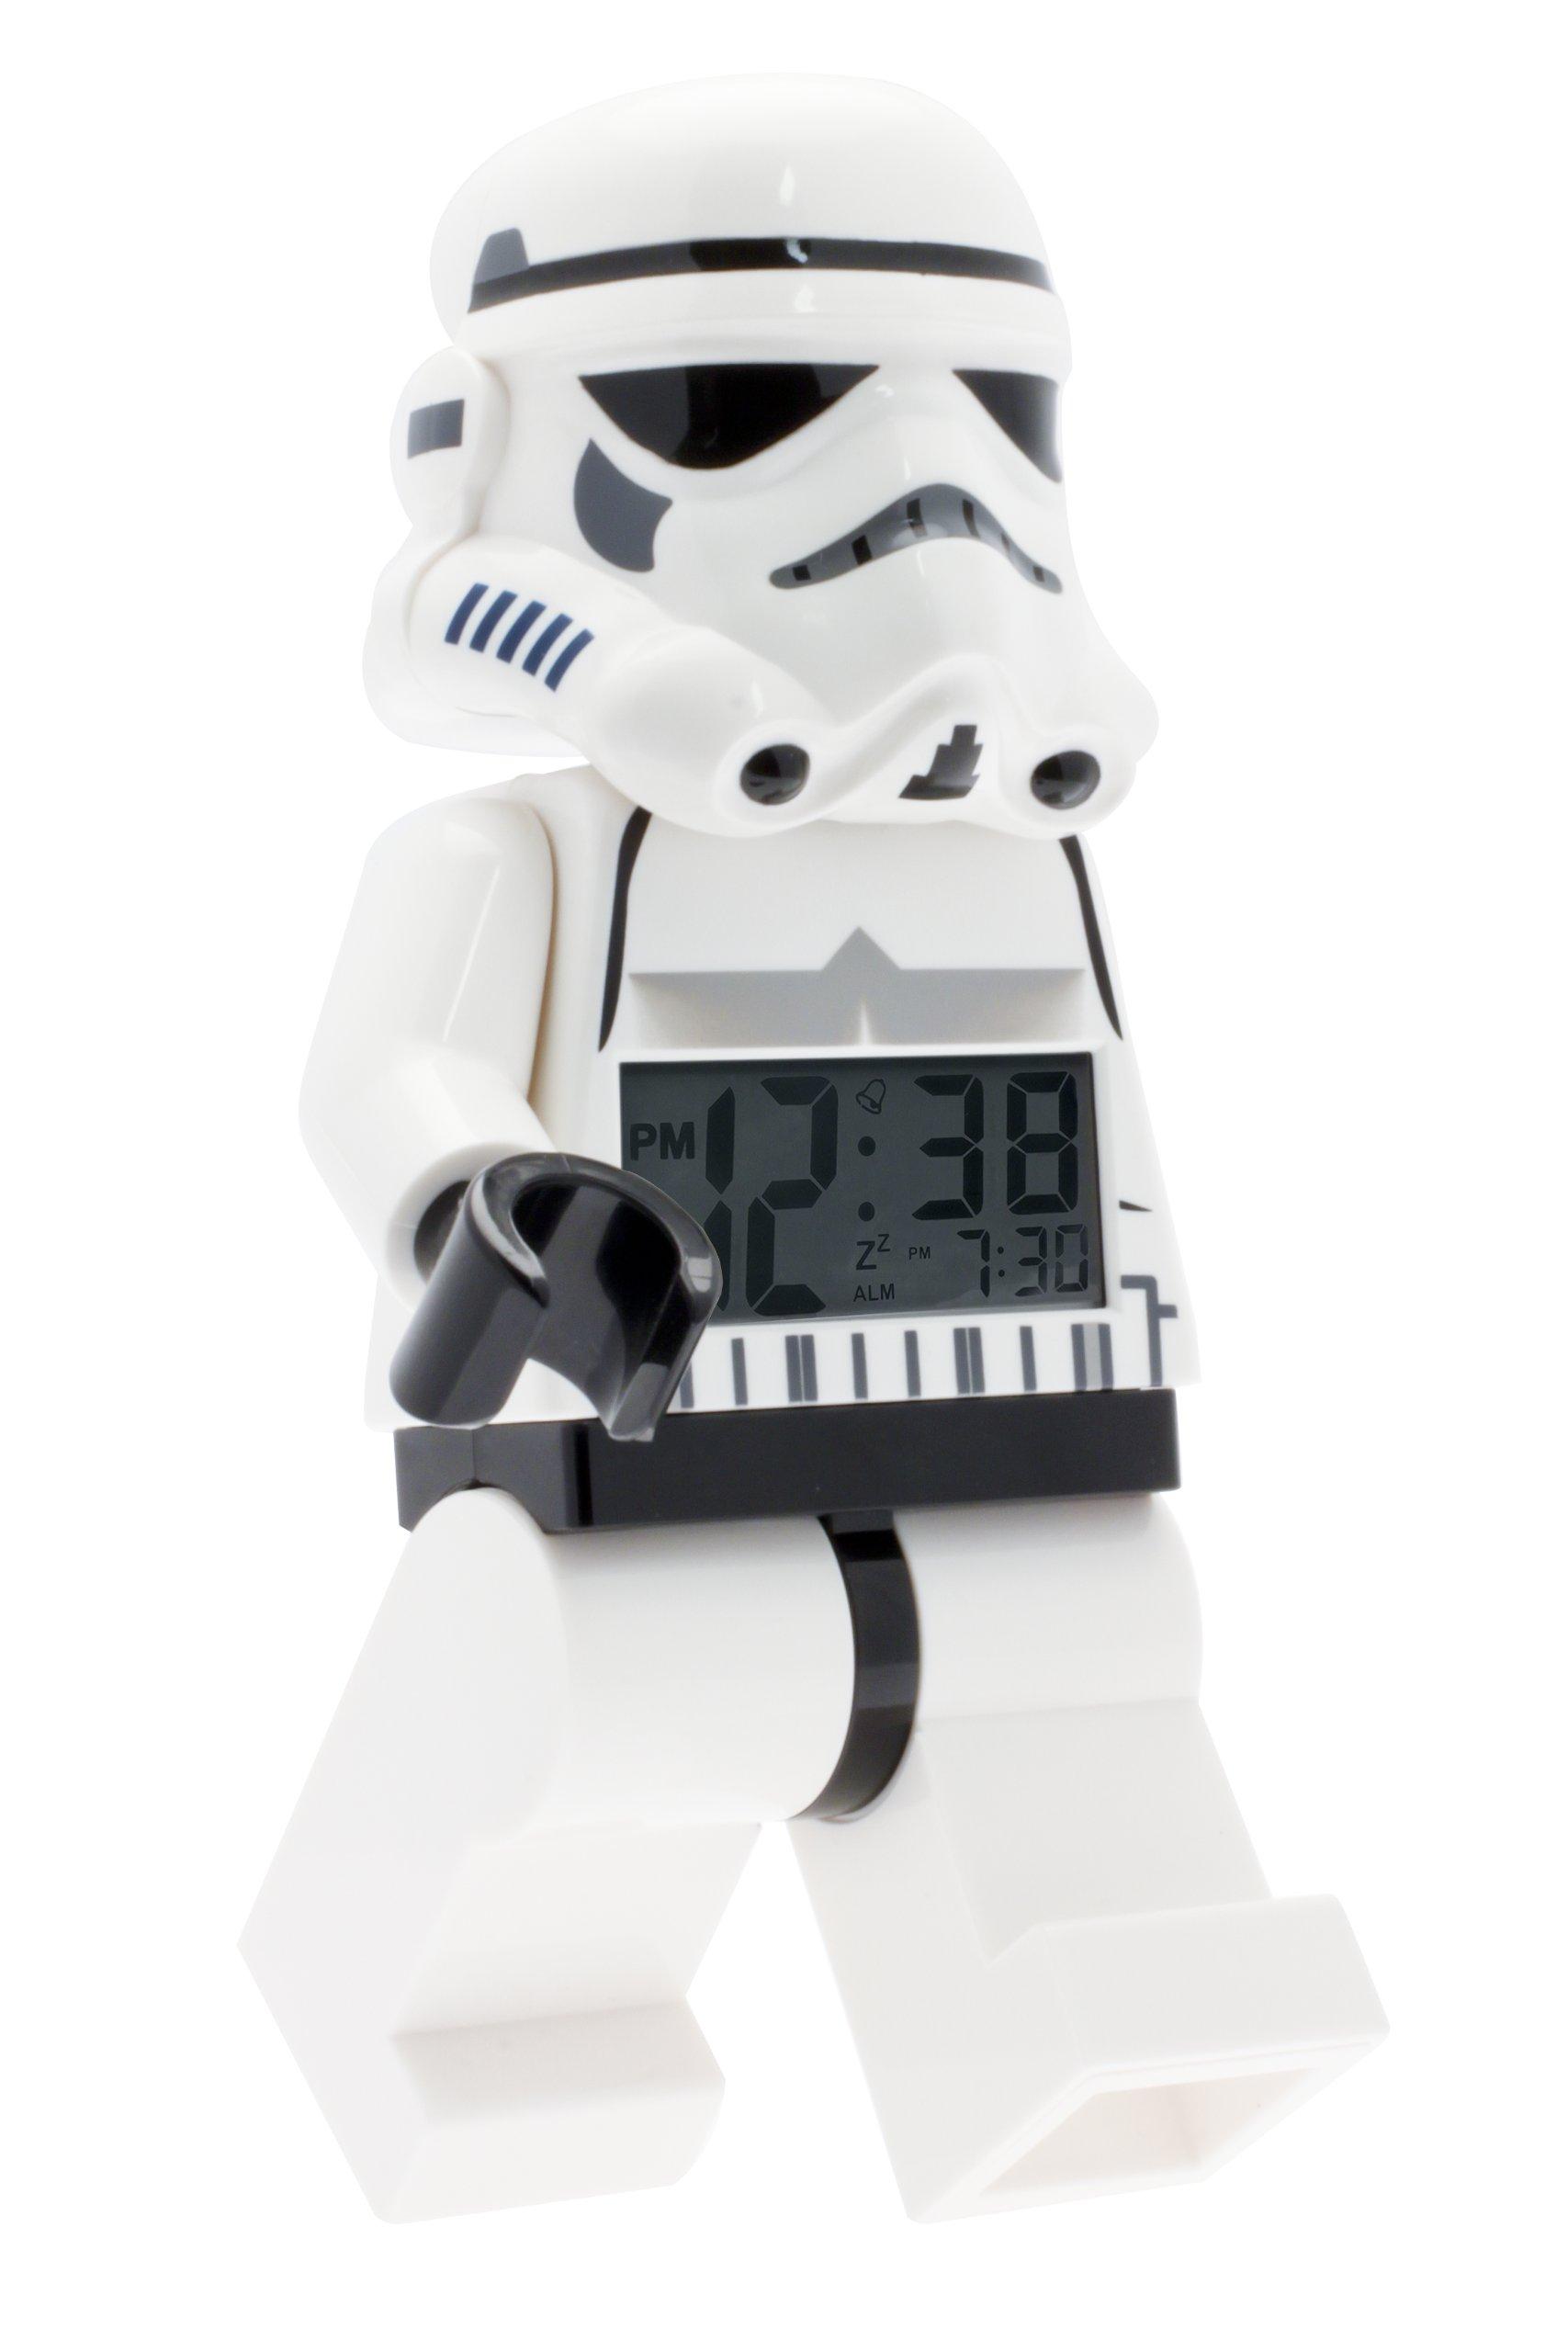 LEGO 乐高手表星球大战达斯维德儿童迷你人型点亮闹钟